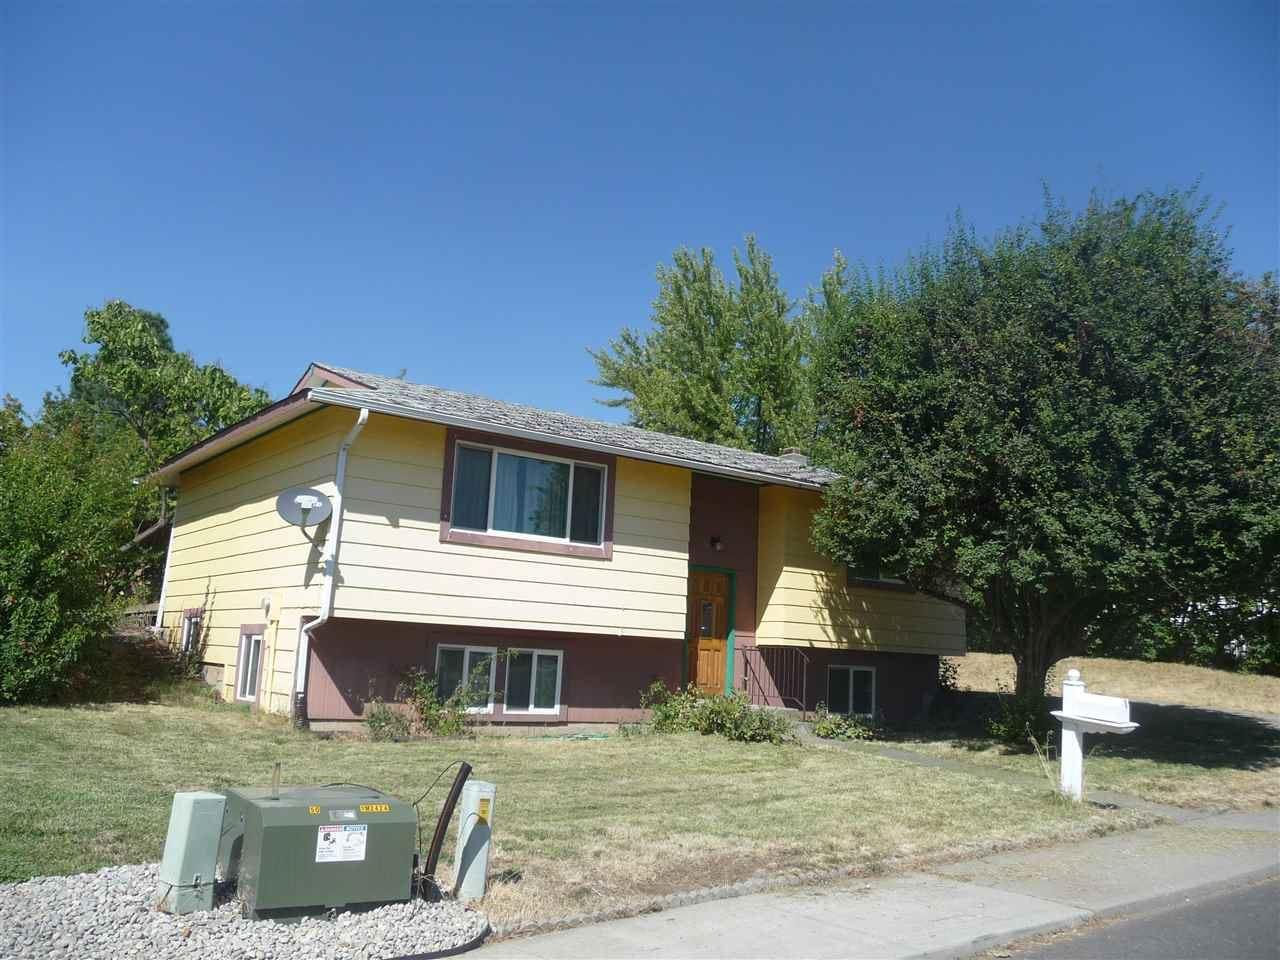 574 Scenic Heights Rd, Cheney, WA 99004-1143 - #: 202021129